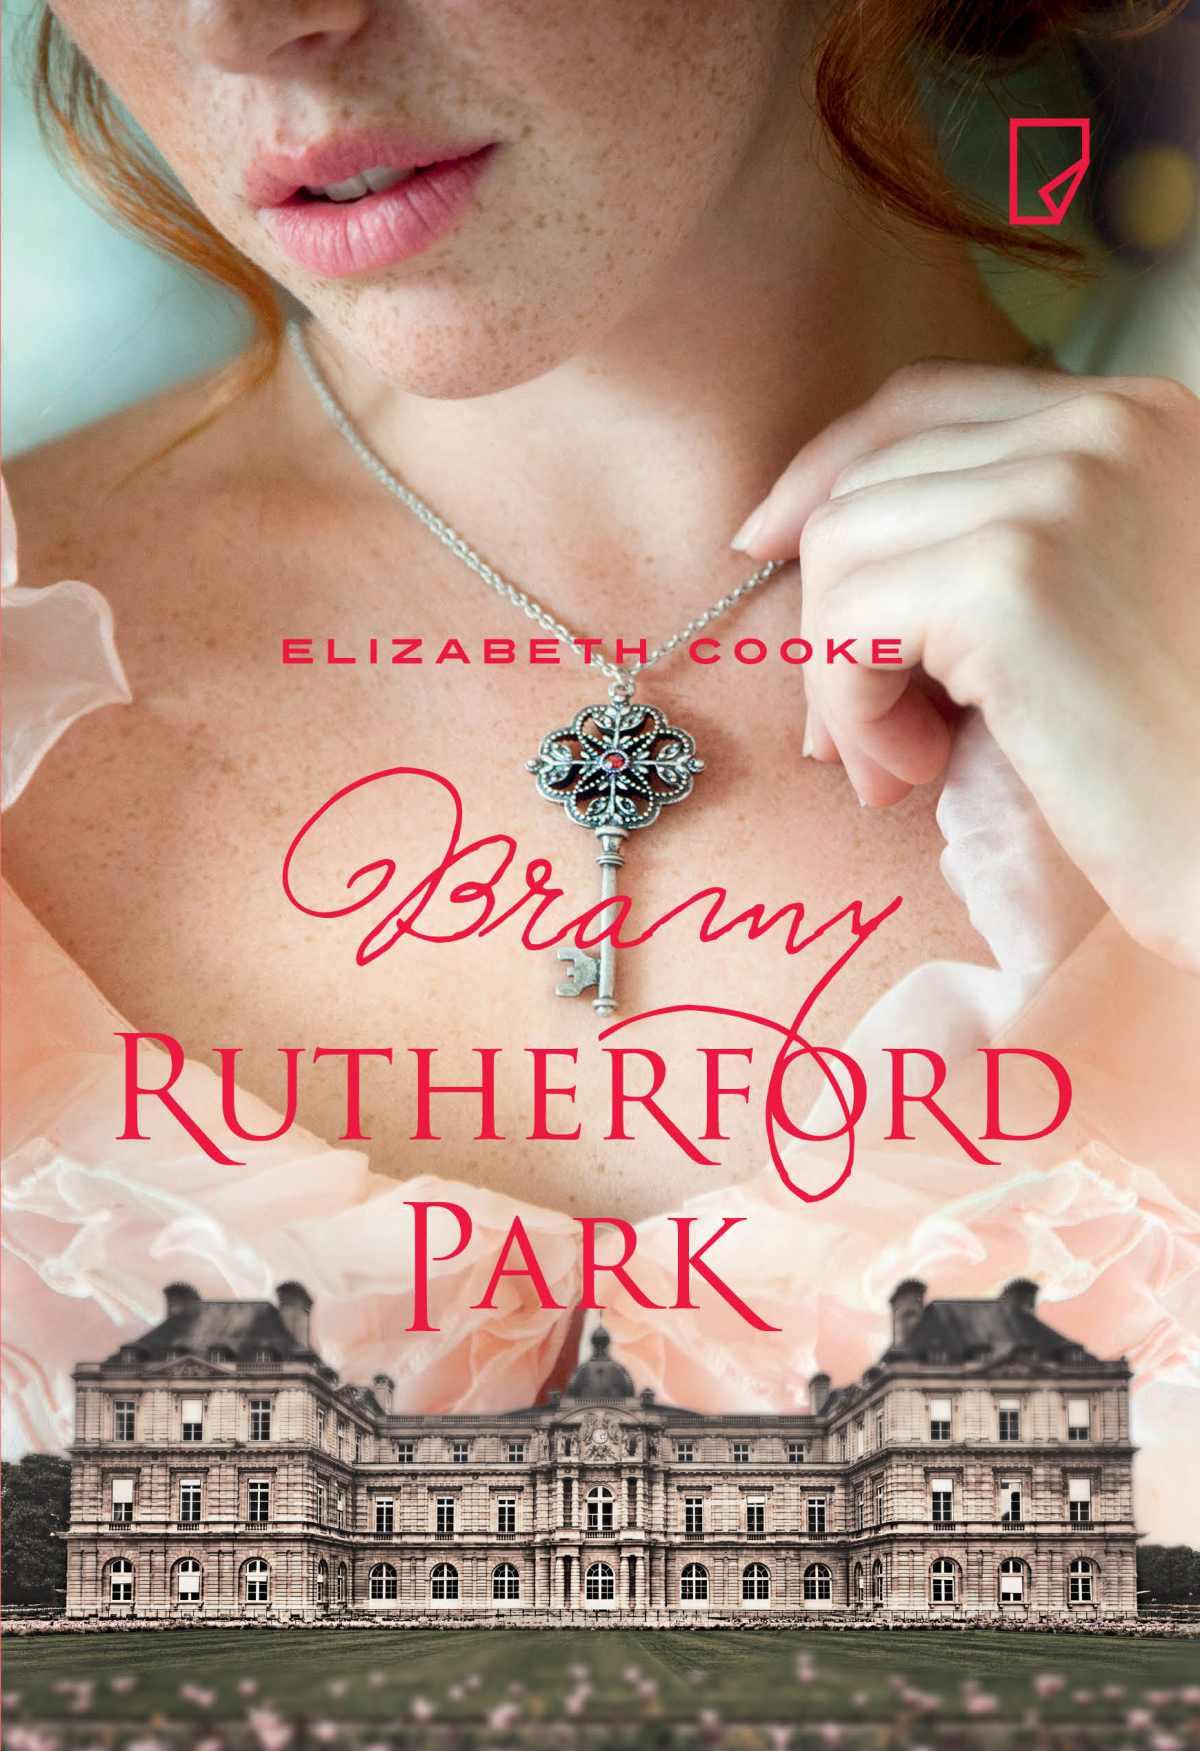 Bramy Rutherford Park - Ebook (Książka EPUB) do pobrania w formacie EPUB